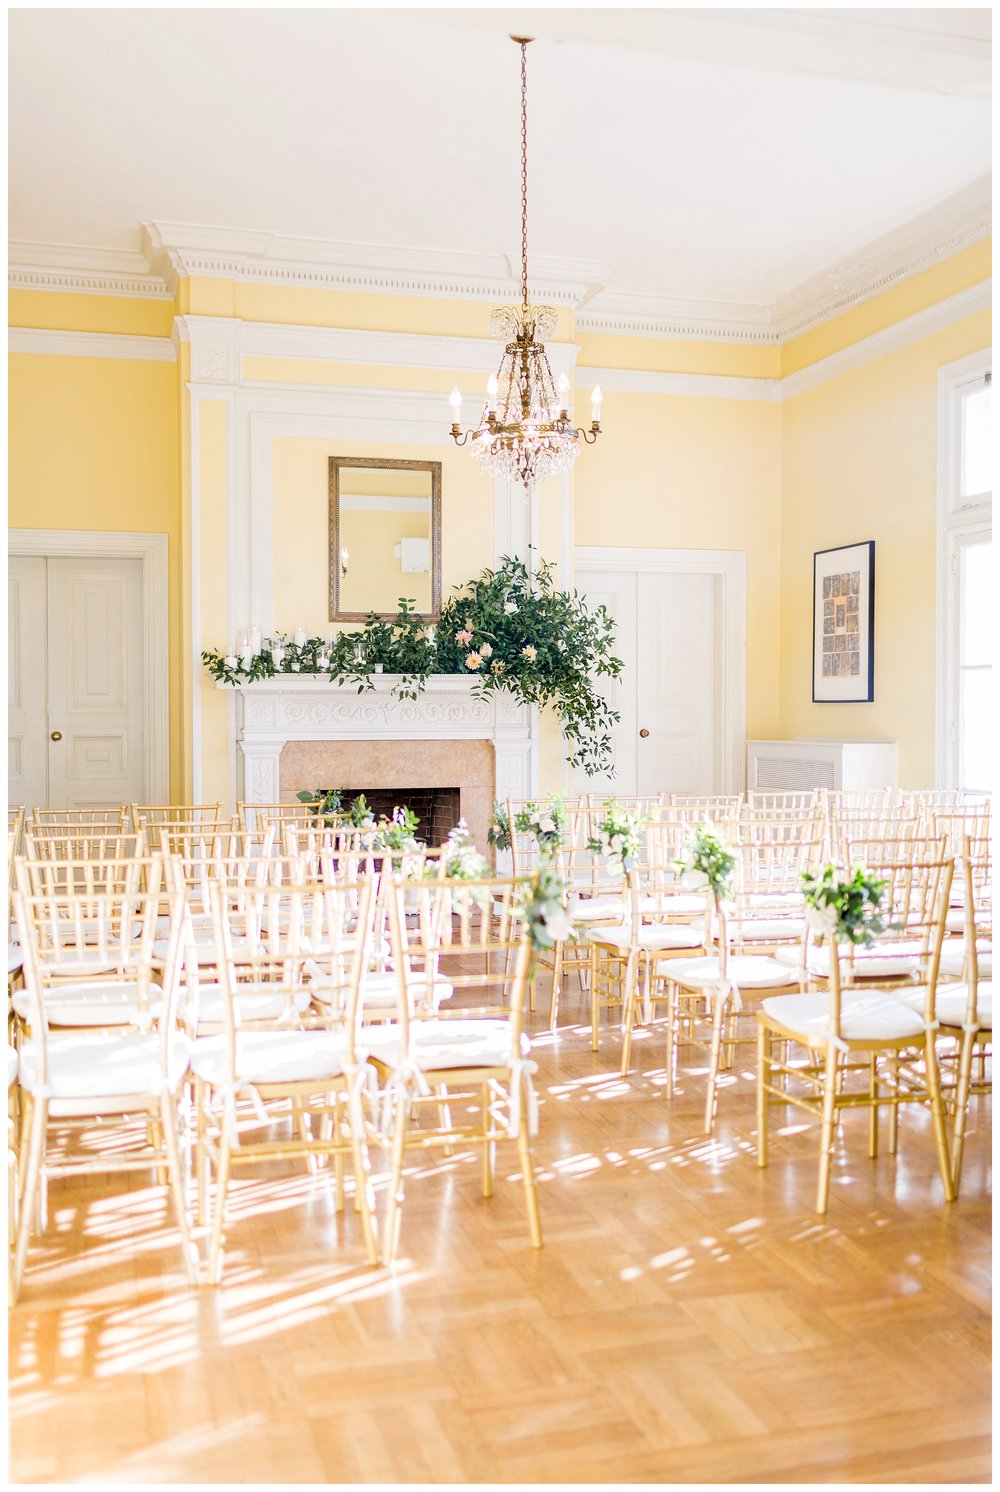 Meridian Hill Park Wedding | Washington DC Wedding Photographer Kir Tuben_0058.jpg